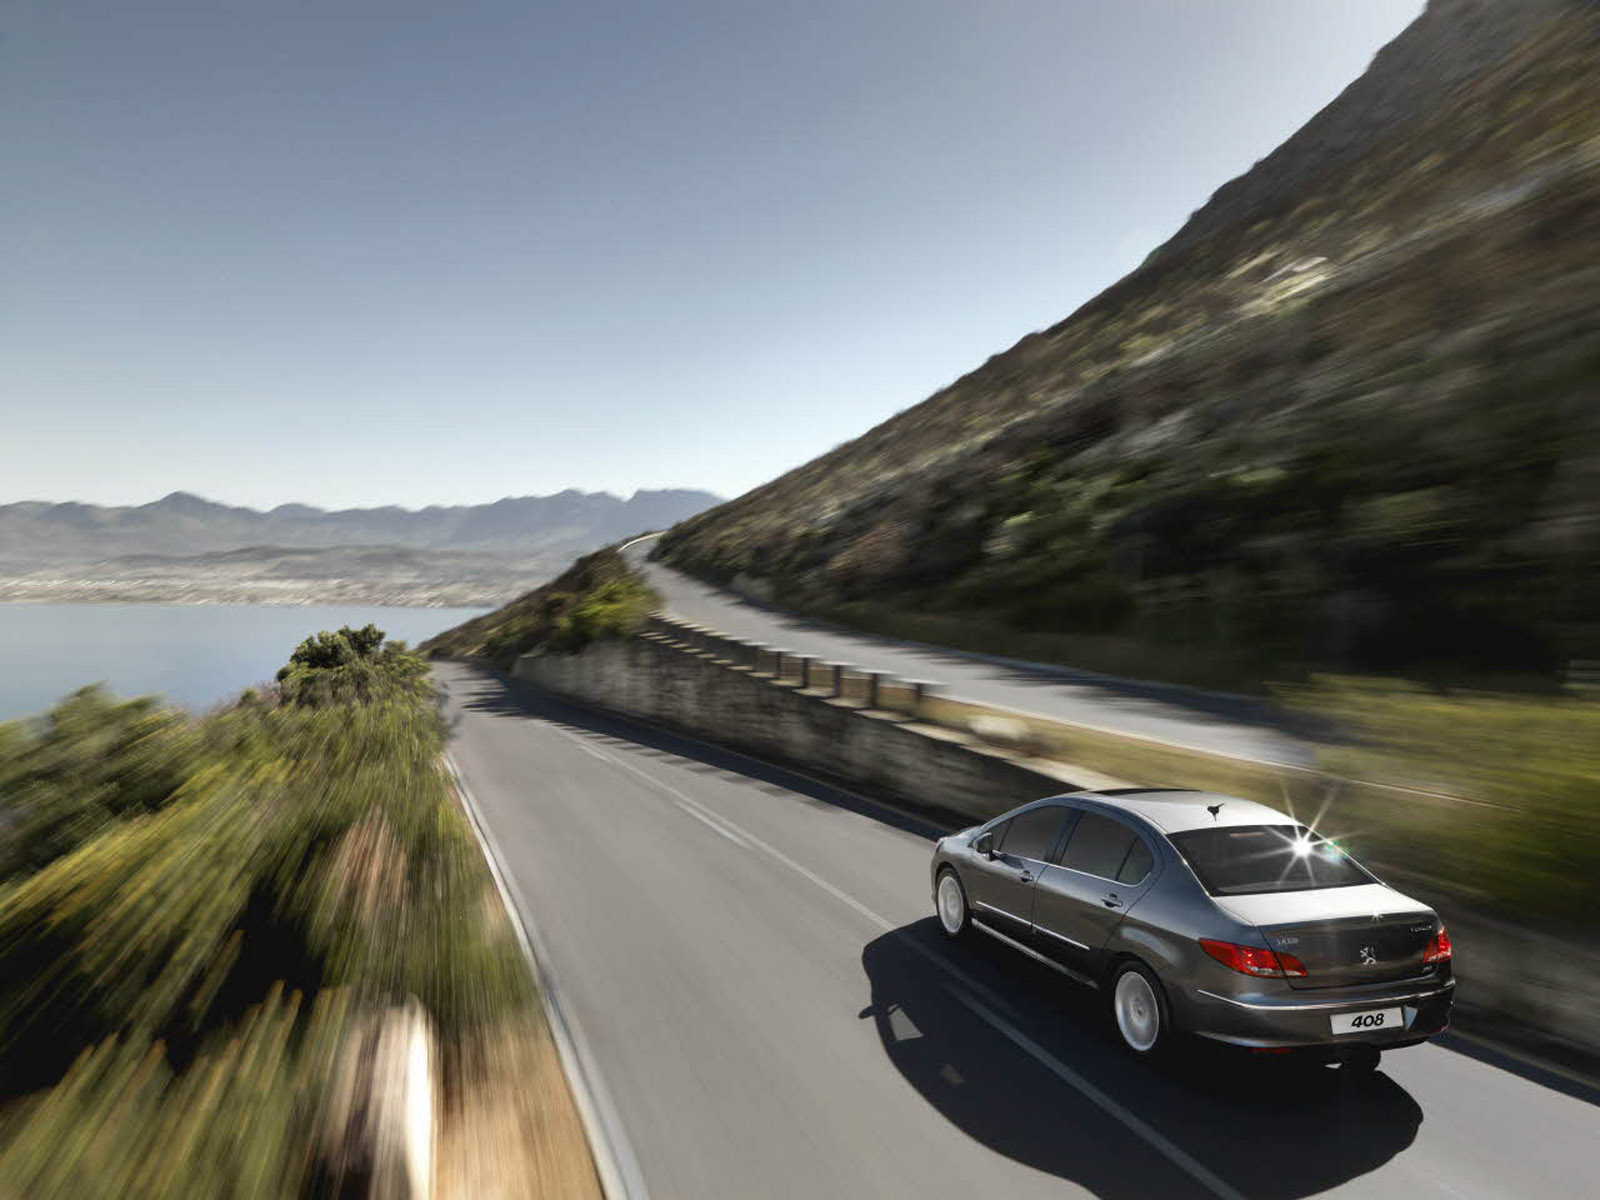 2012 Kahn Bmw X5 5s 3 Od Offers Luxury Interior And